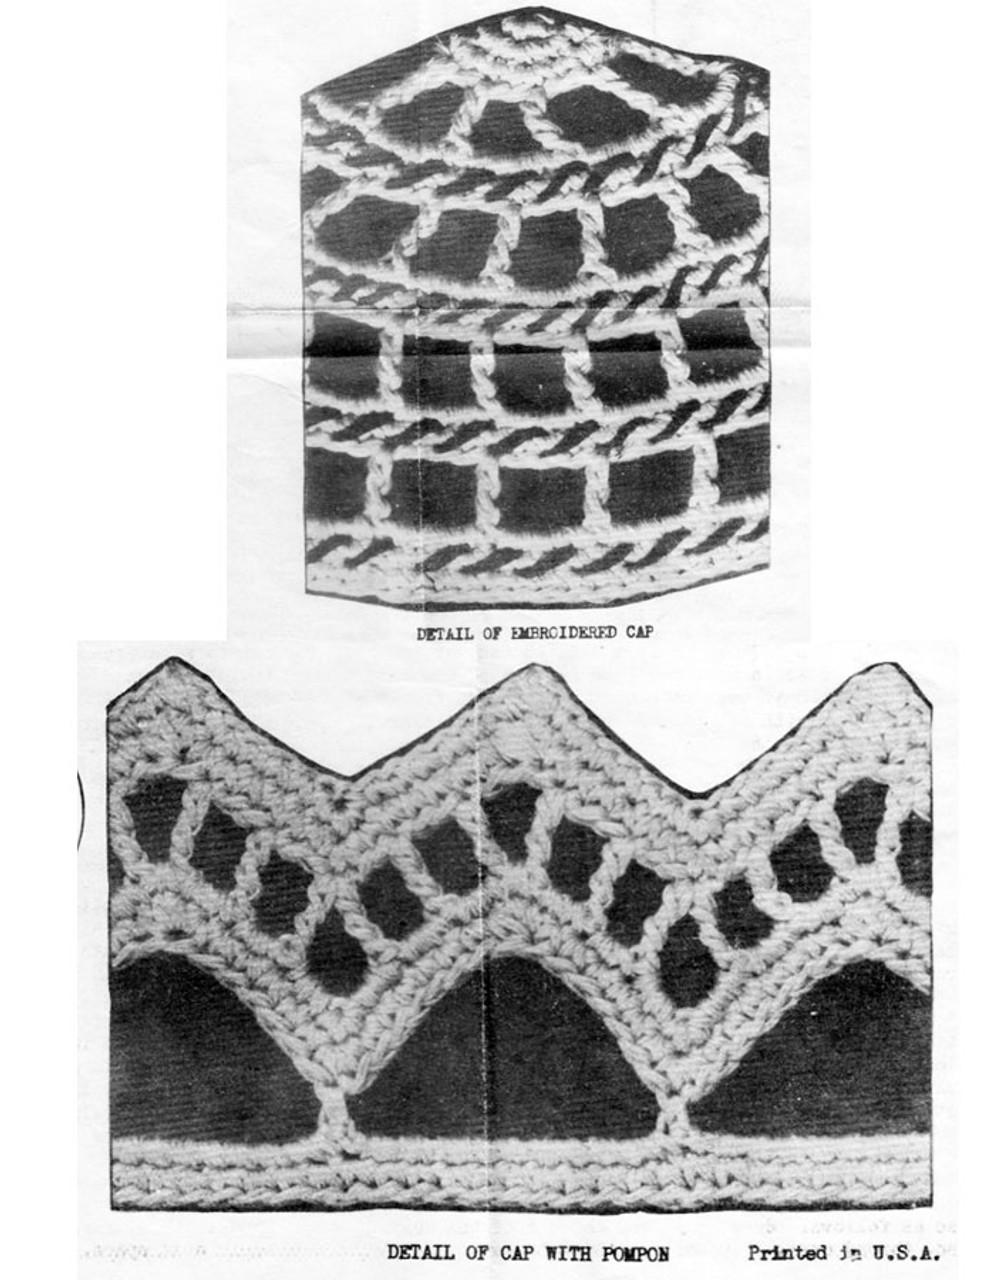 Crochet Caps Pattern, 2 Styles, Laura Wheeler 1746